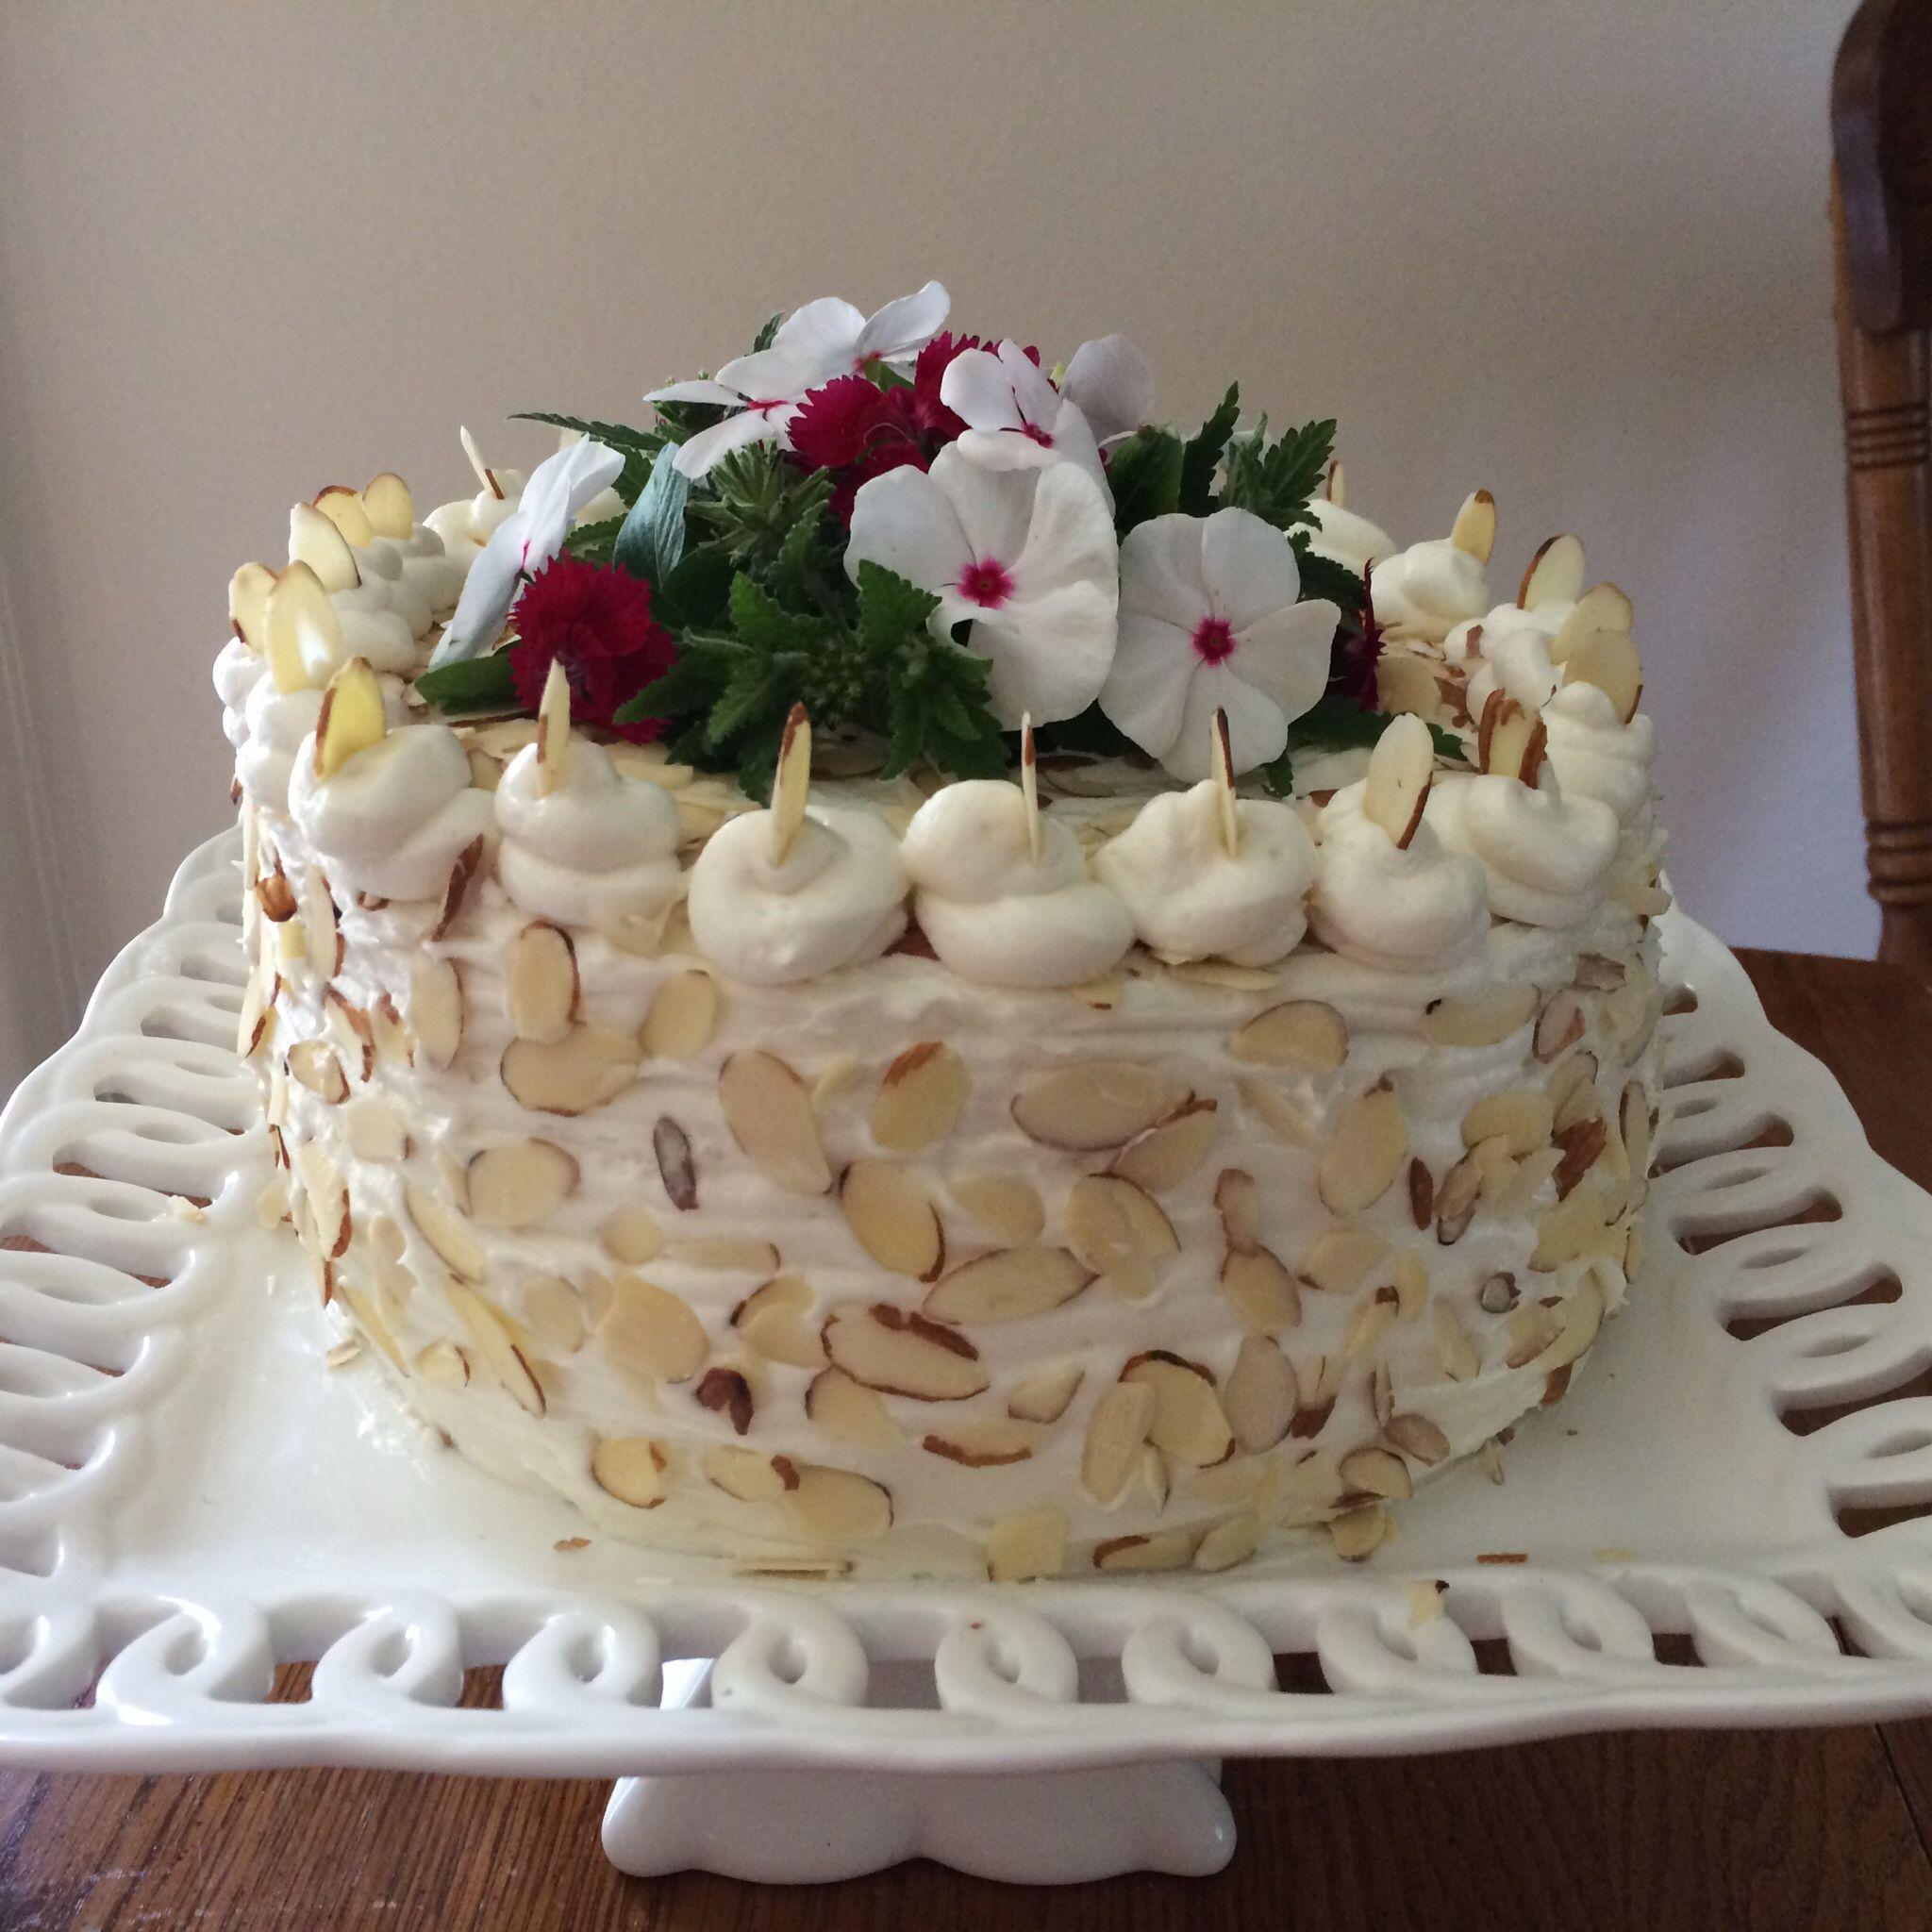 Sharon Shaws Birthday Cake Almond Amaretto The Blue Willow